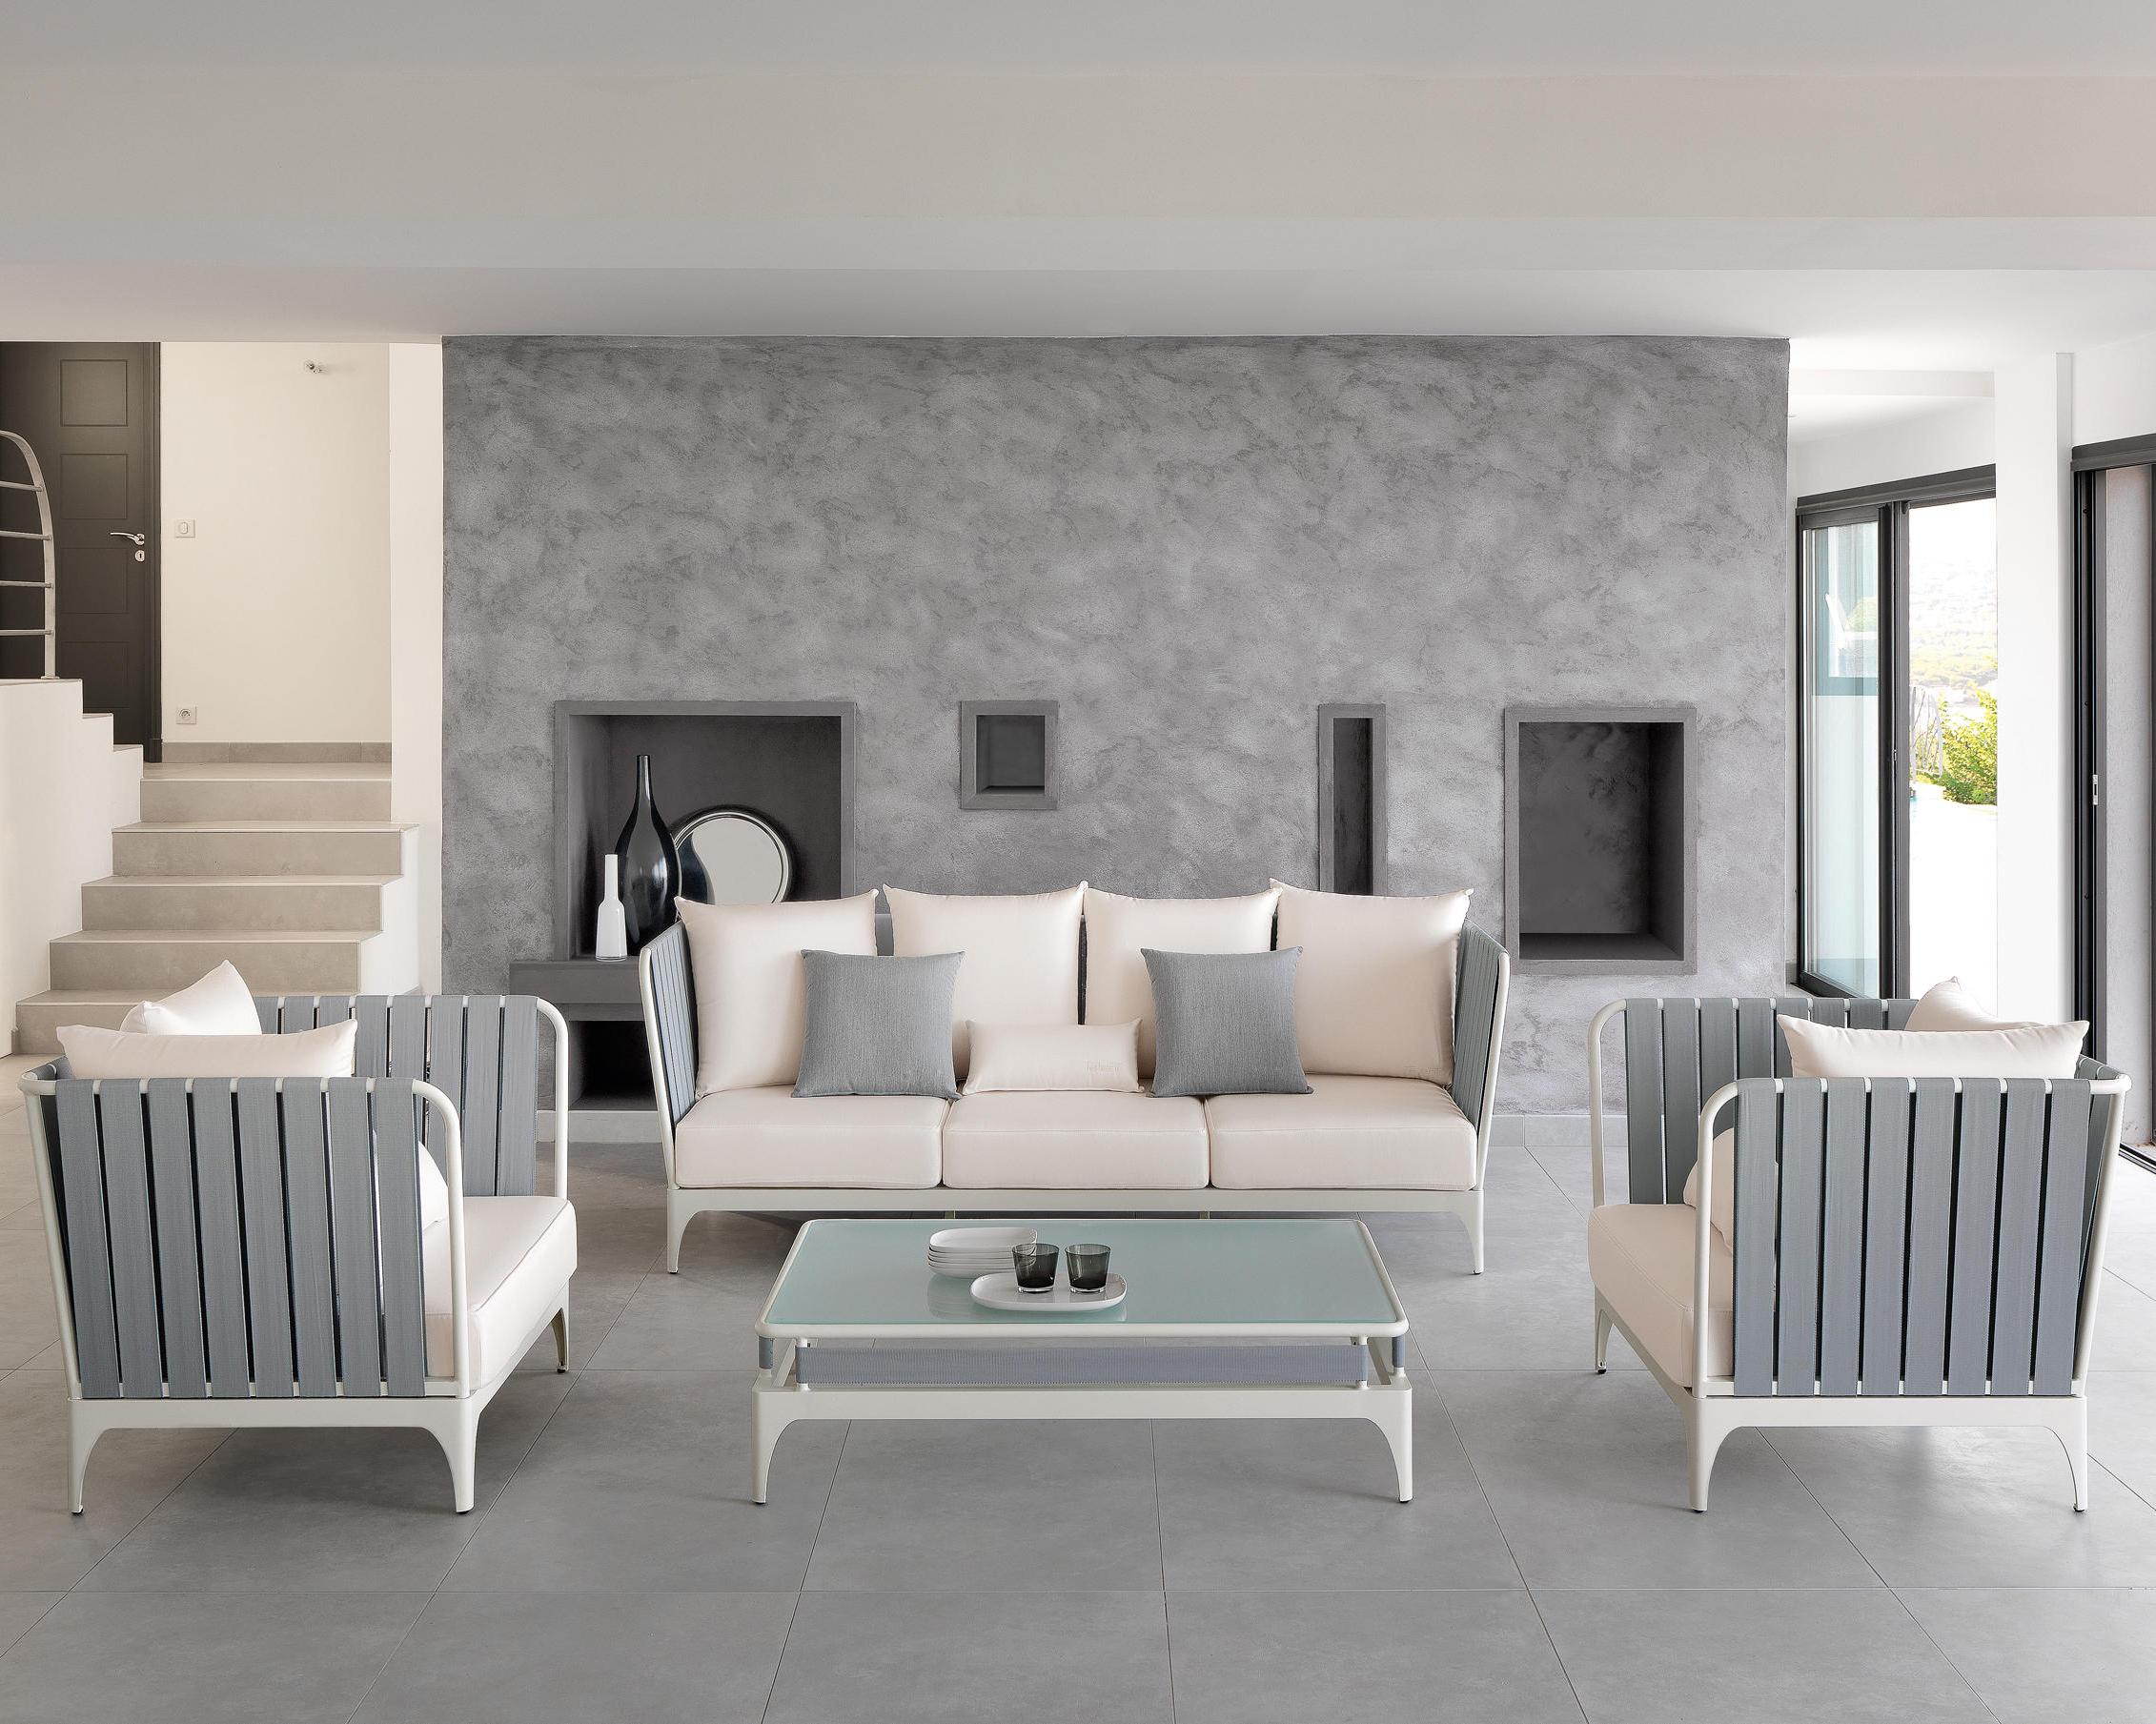 MG-S018户外沙发客厅阳台藤椅沙发双人创意庭院休闲茶几